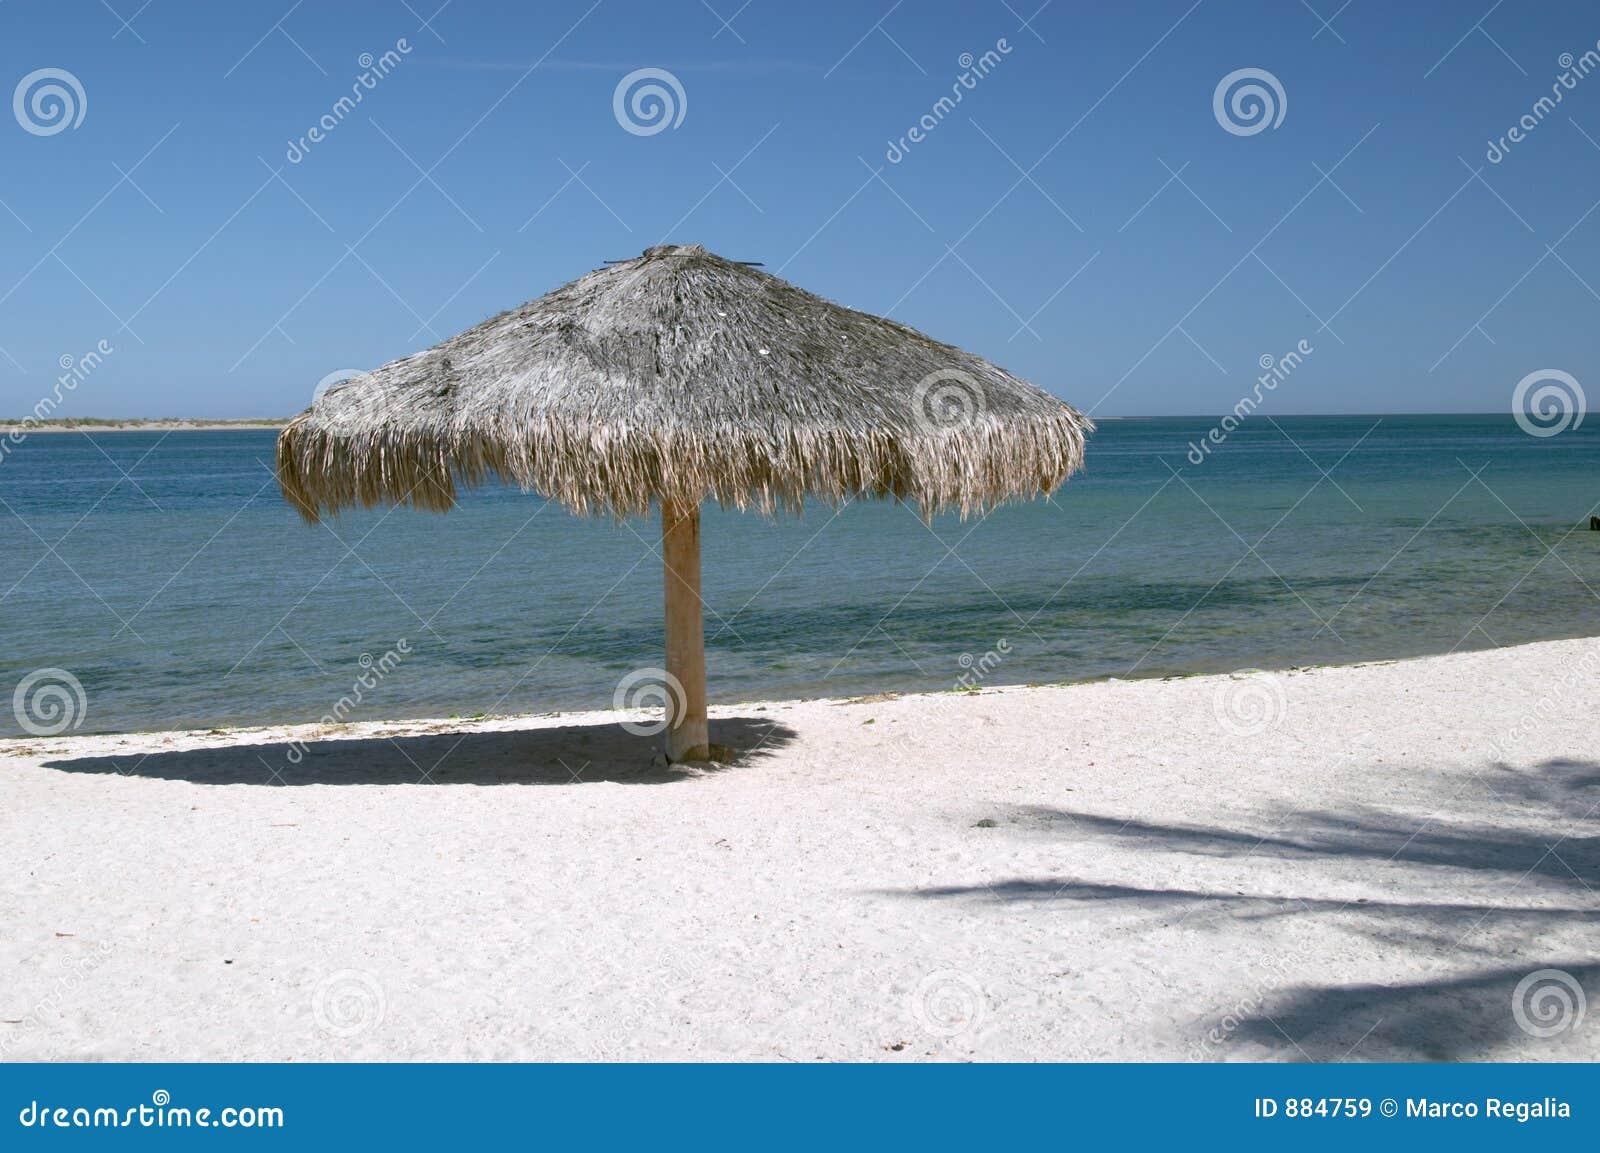 Umbrella on La Paz beach